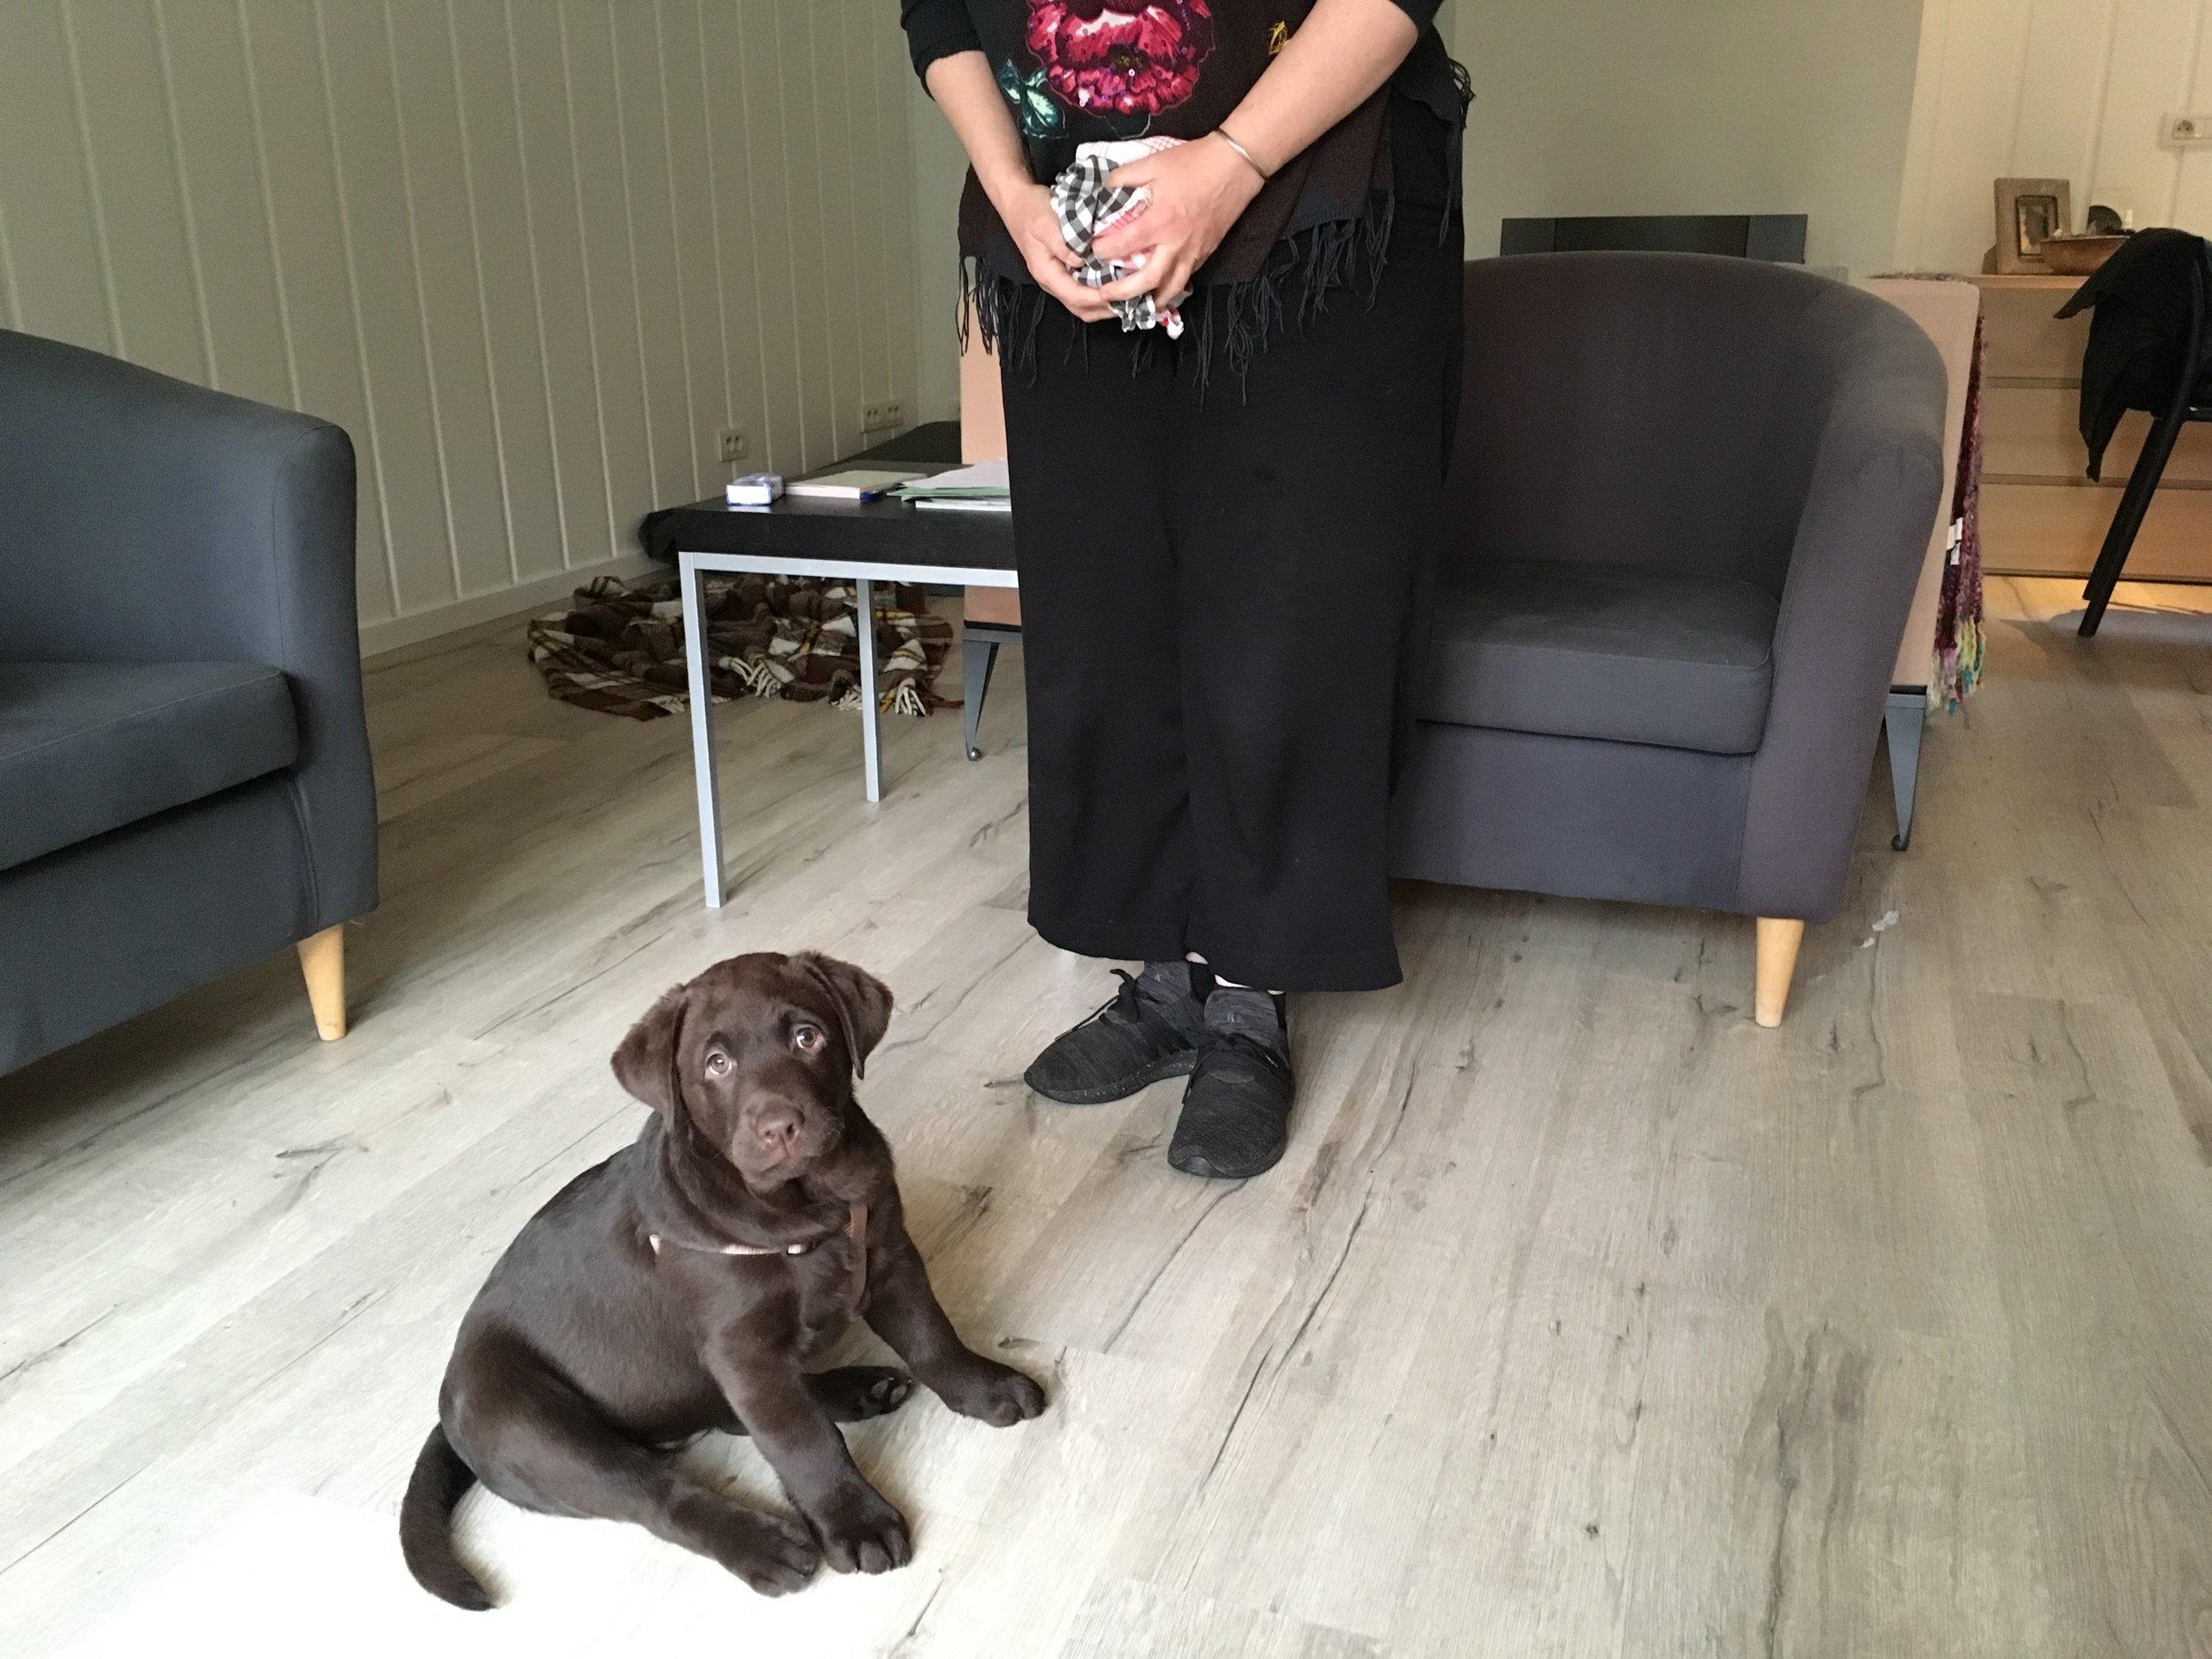 Vina, Labrador teef, therapiehond bij Sofie De Burchgrave